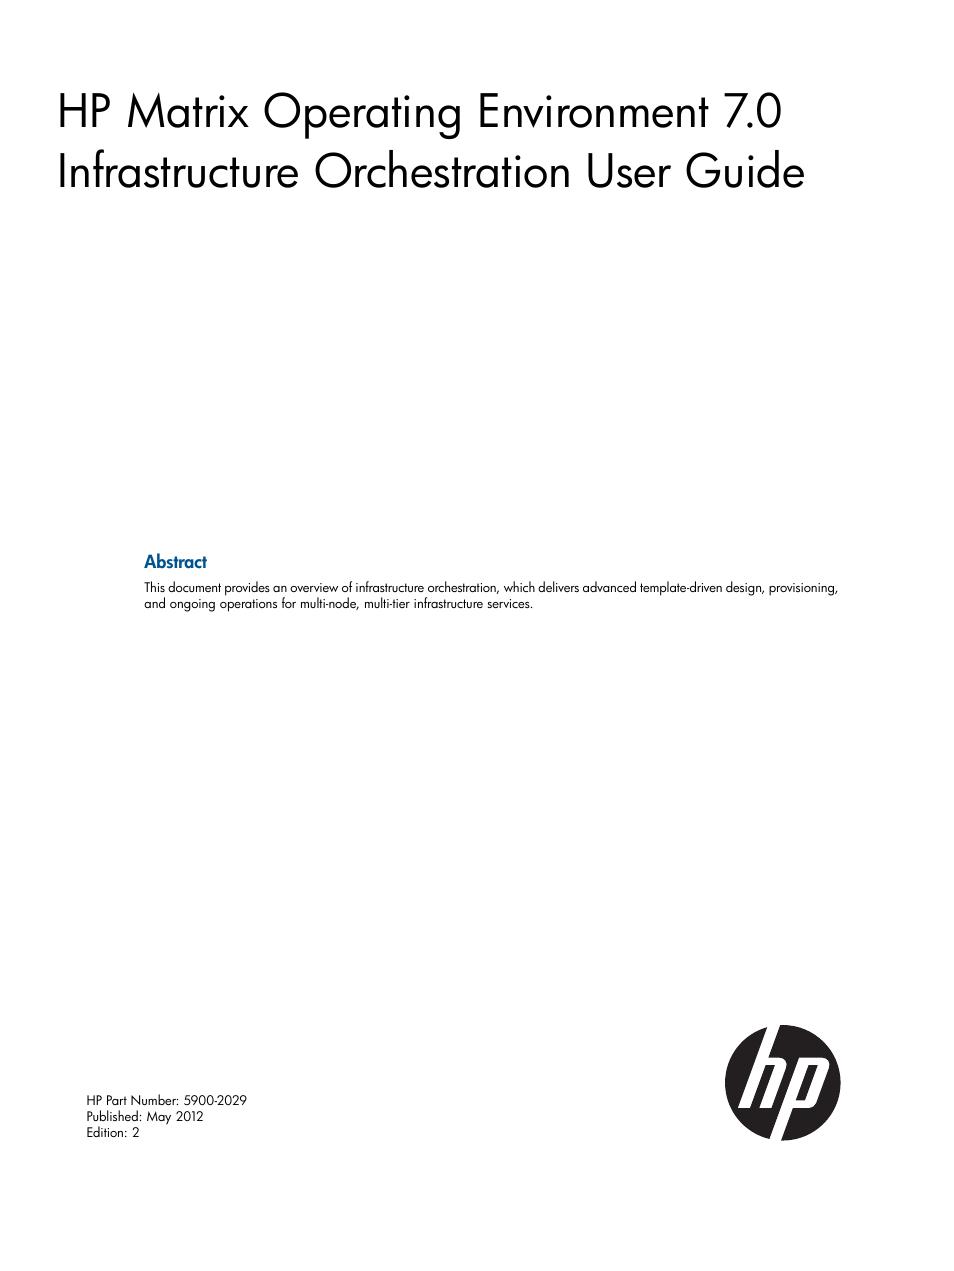 HP Matrix Operating Environment Software User Manual | 209 pages